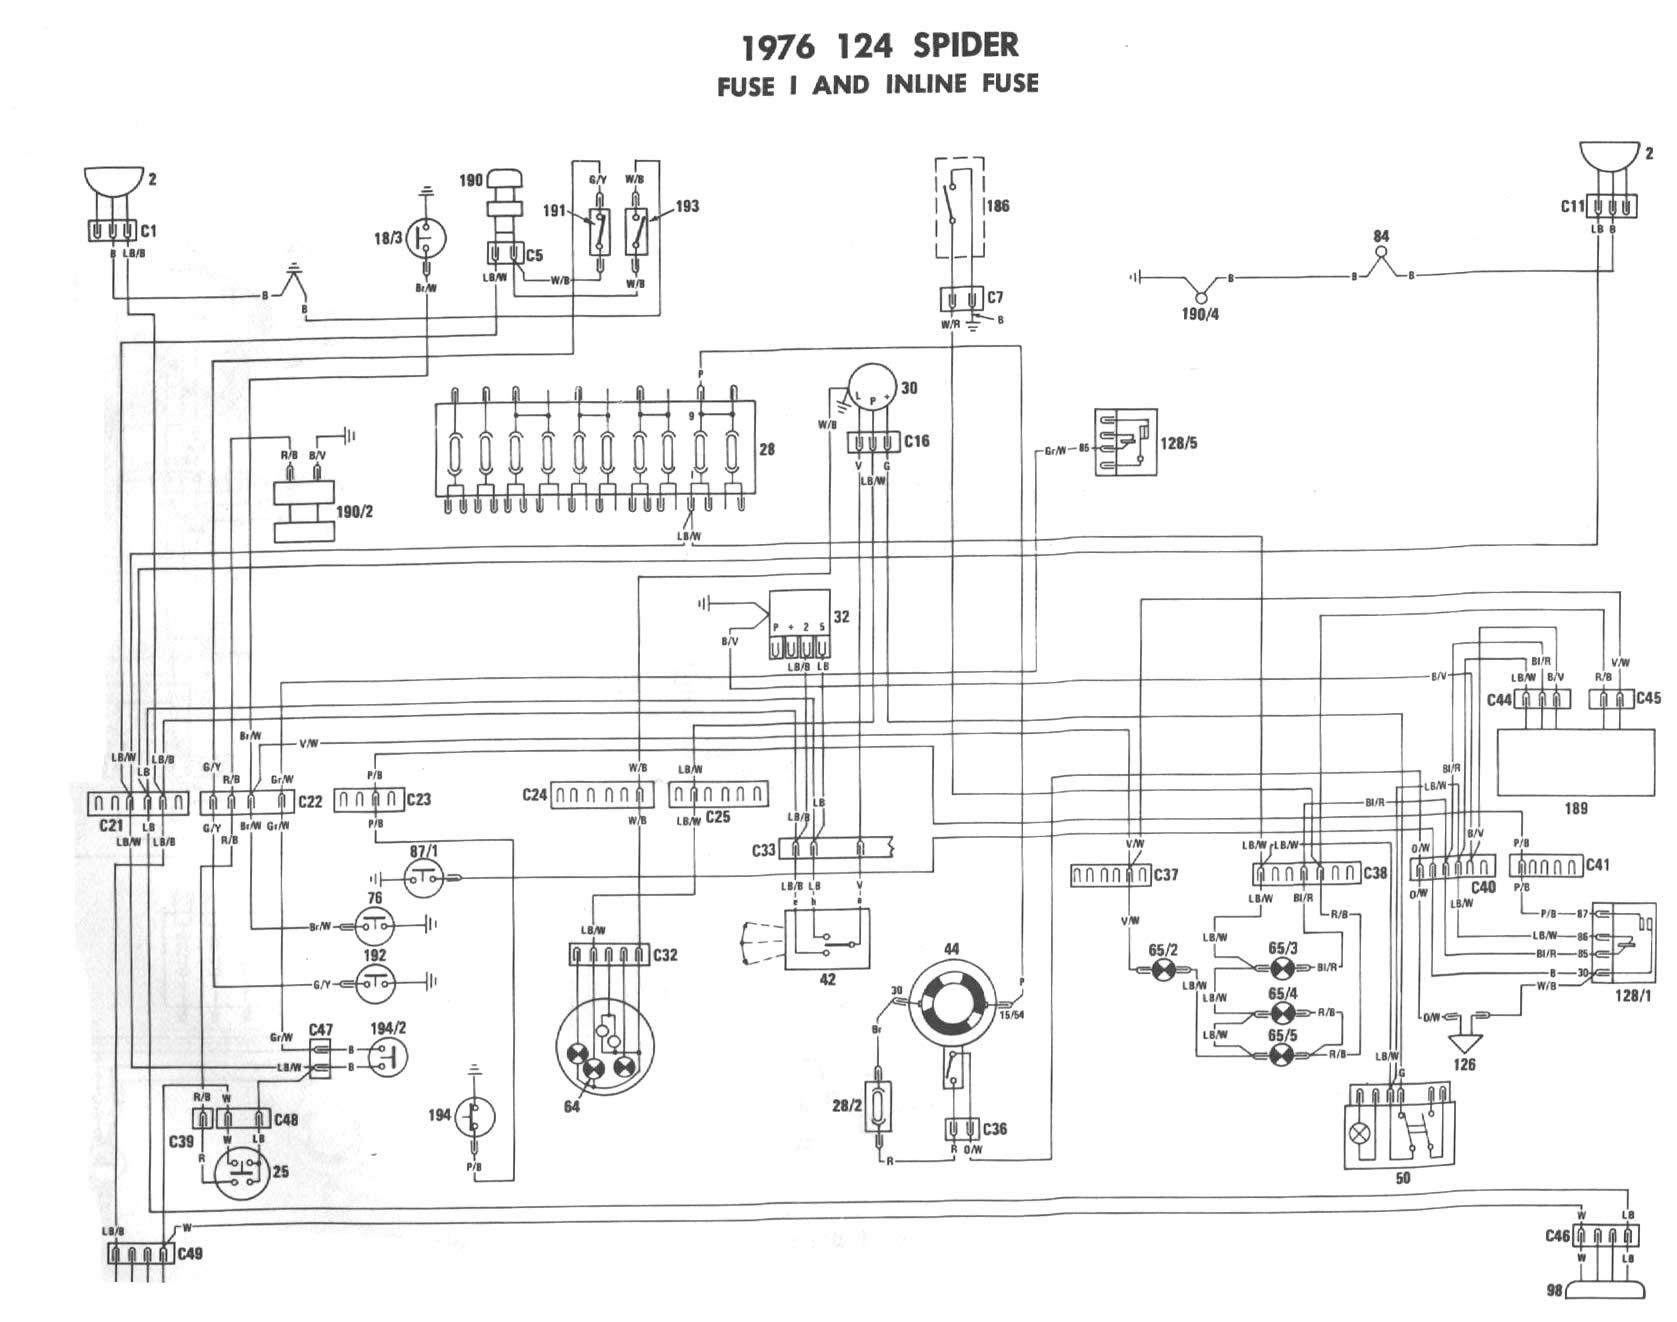 simplicity regent wiring diagram 2 7 fearless wonder de \u2022simplicity wiring diagrams components electrical circuit rh 5v wd wipe site diagram regent wiring simplicity 2691330